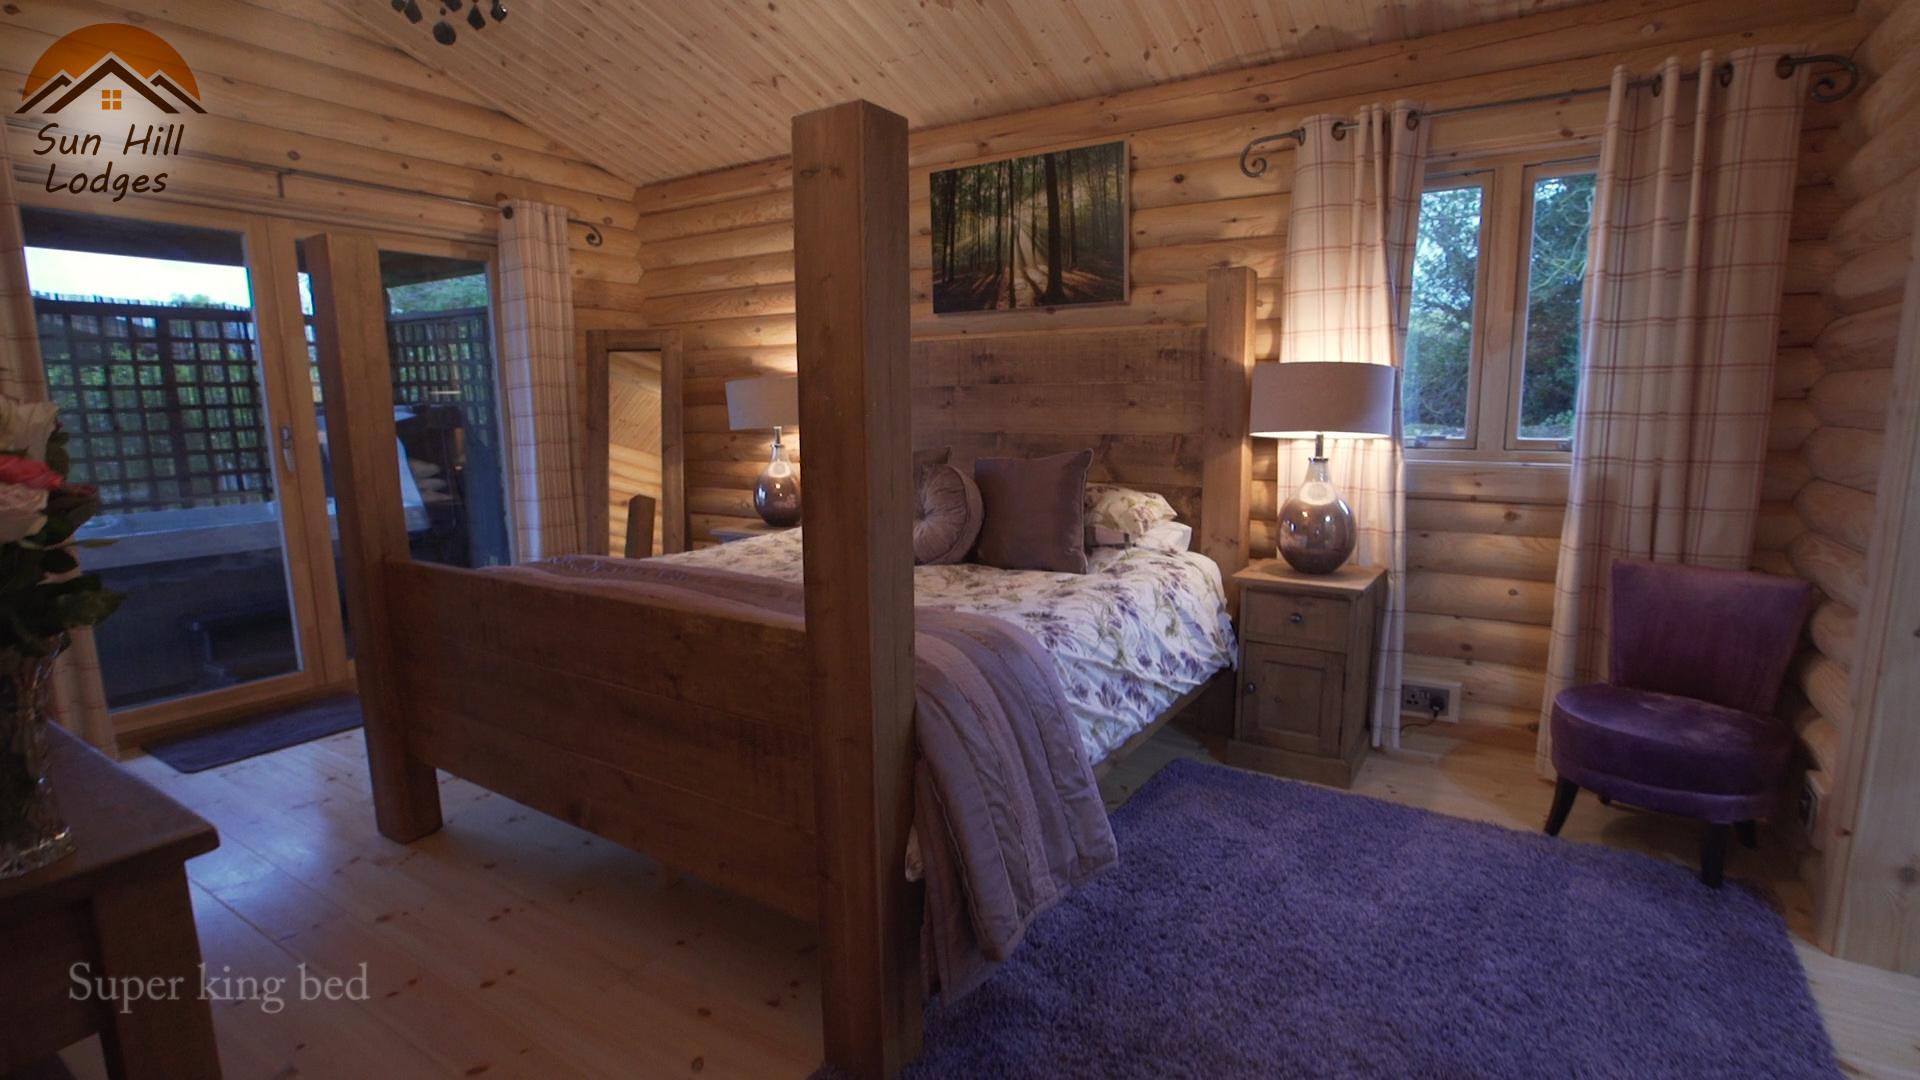 Lodge9_Sunhill.jpg